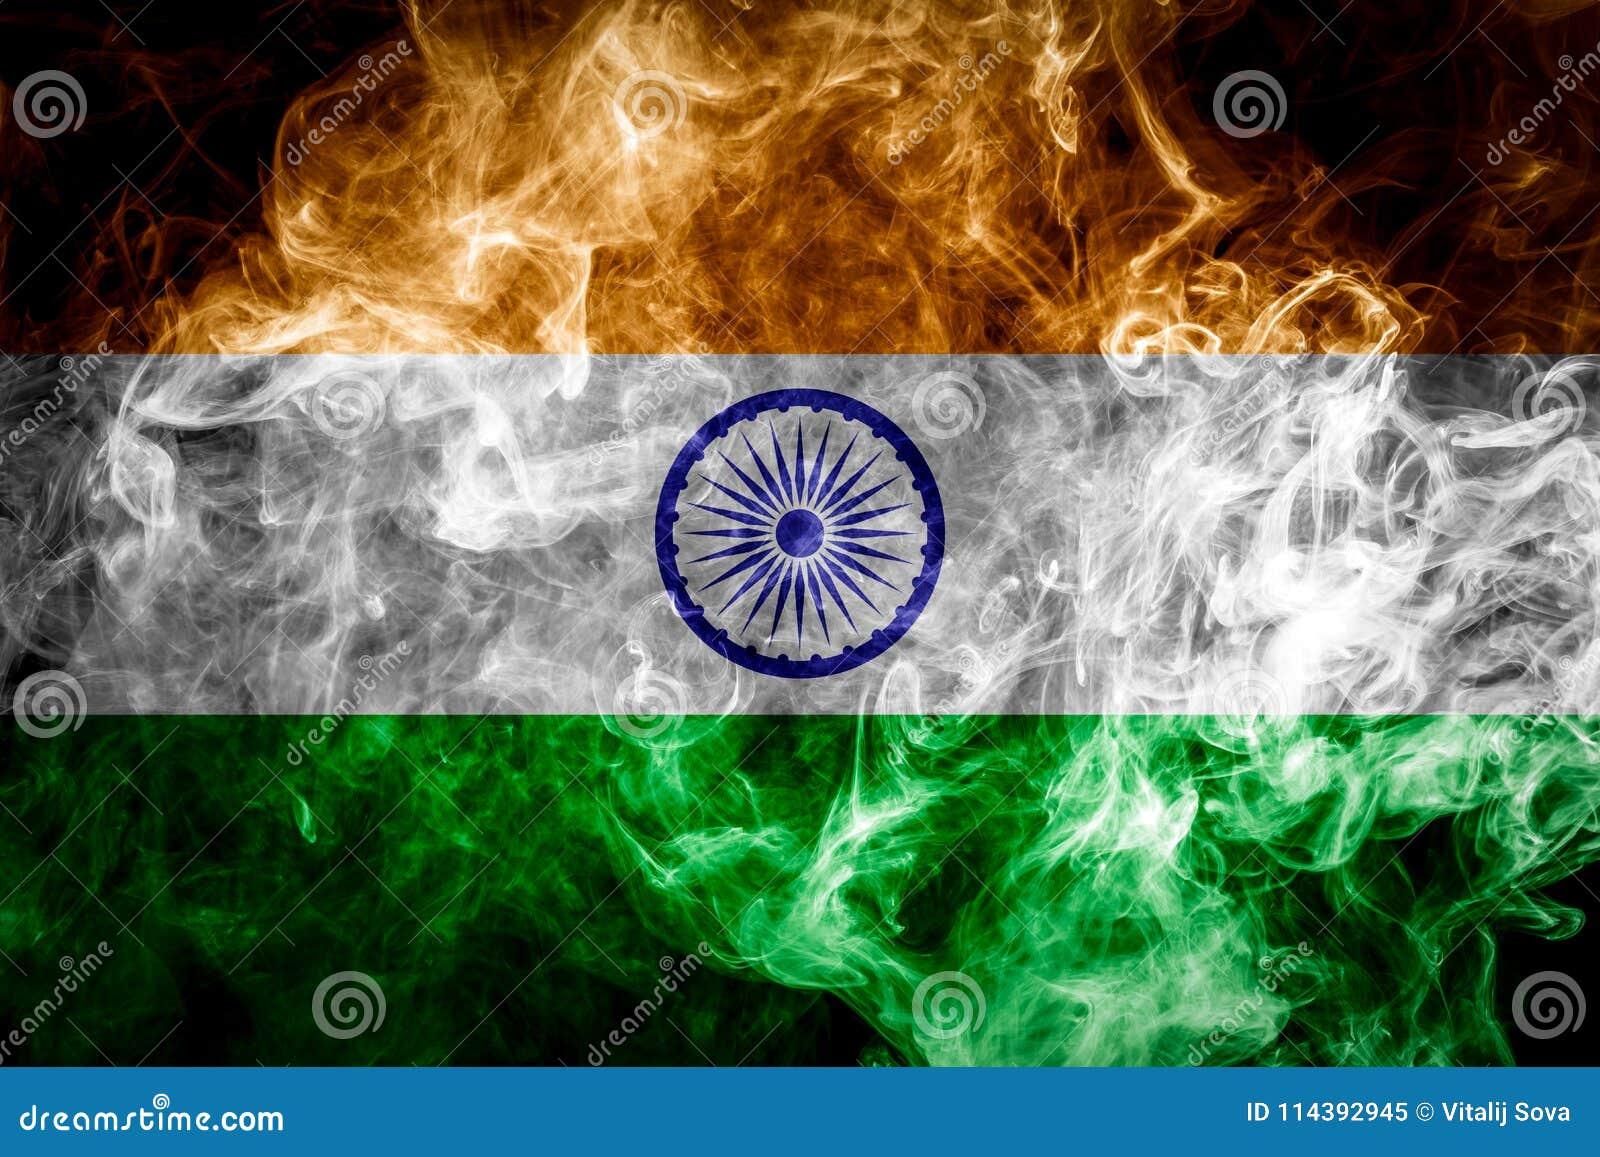 India Flag Black: Painting Flag India Stock Photos